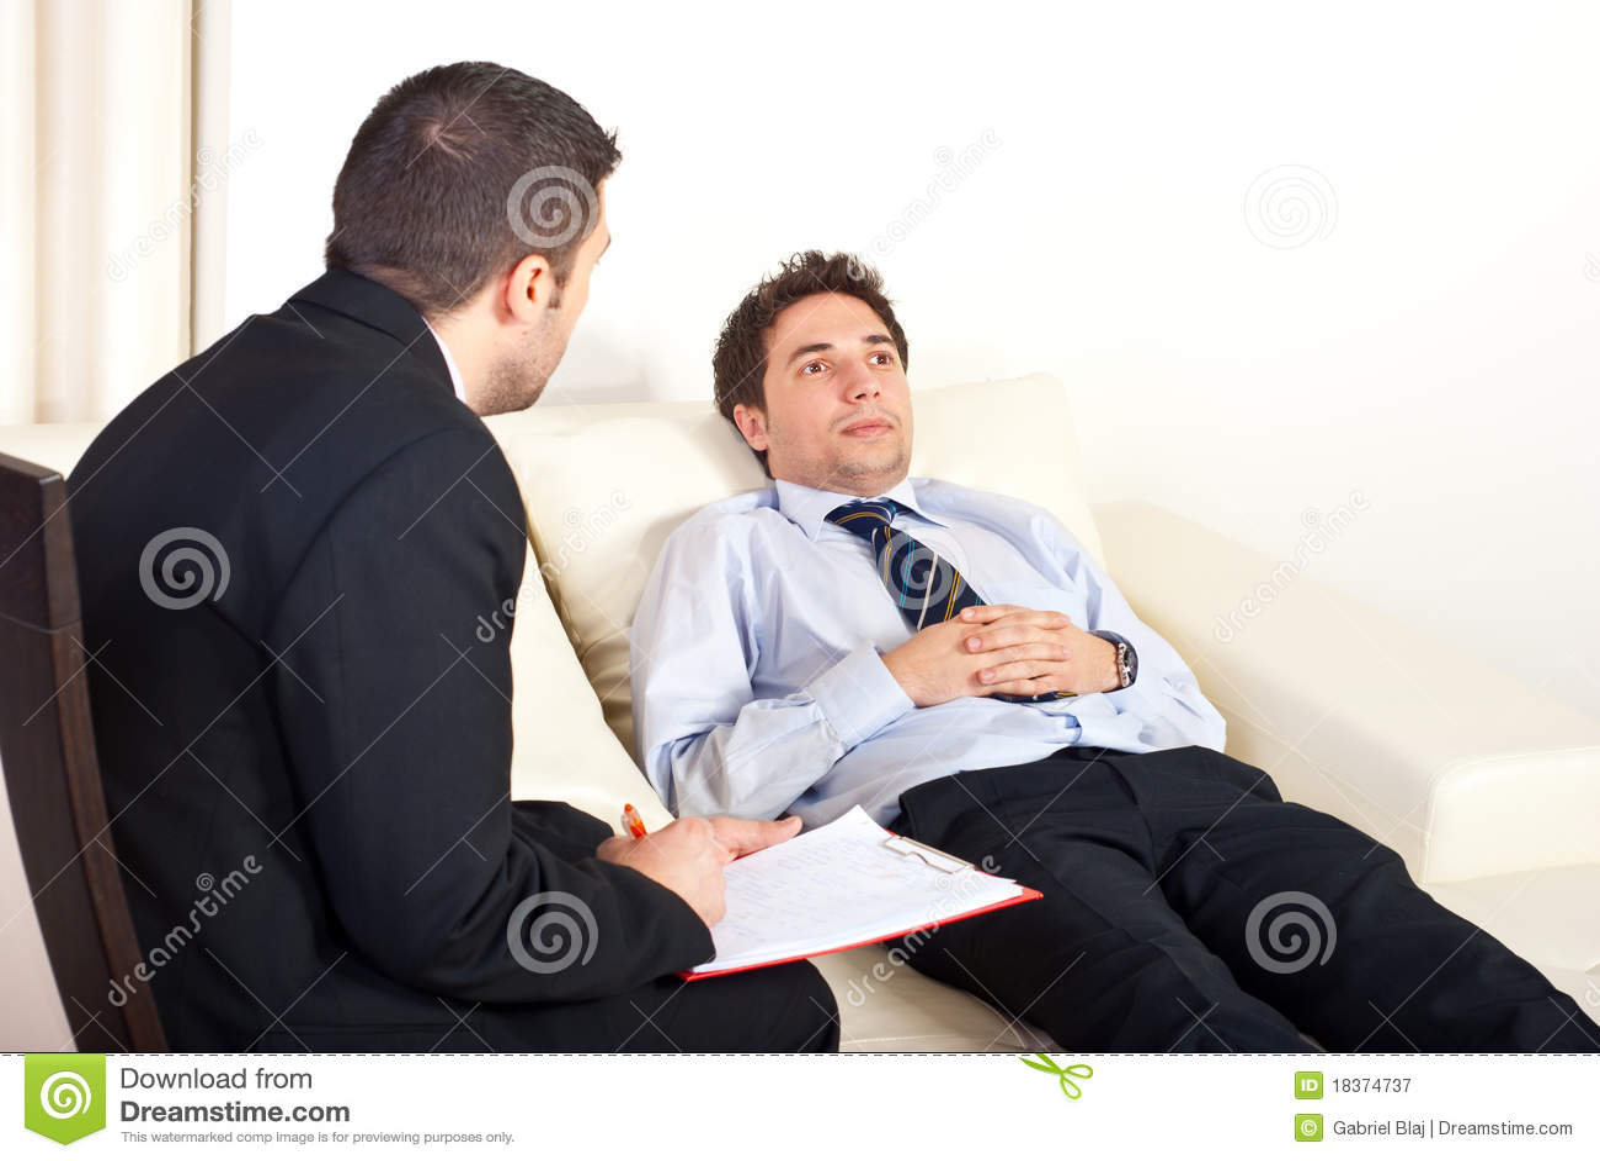 Psychiatrist with male patient